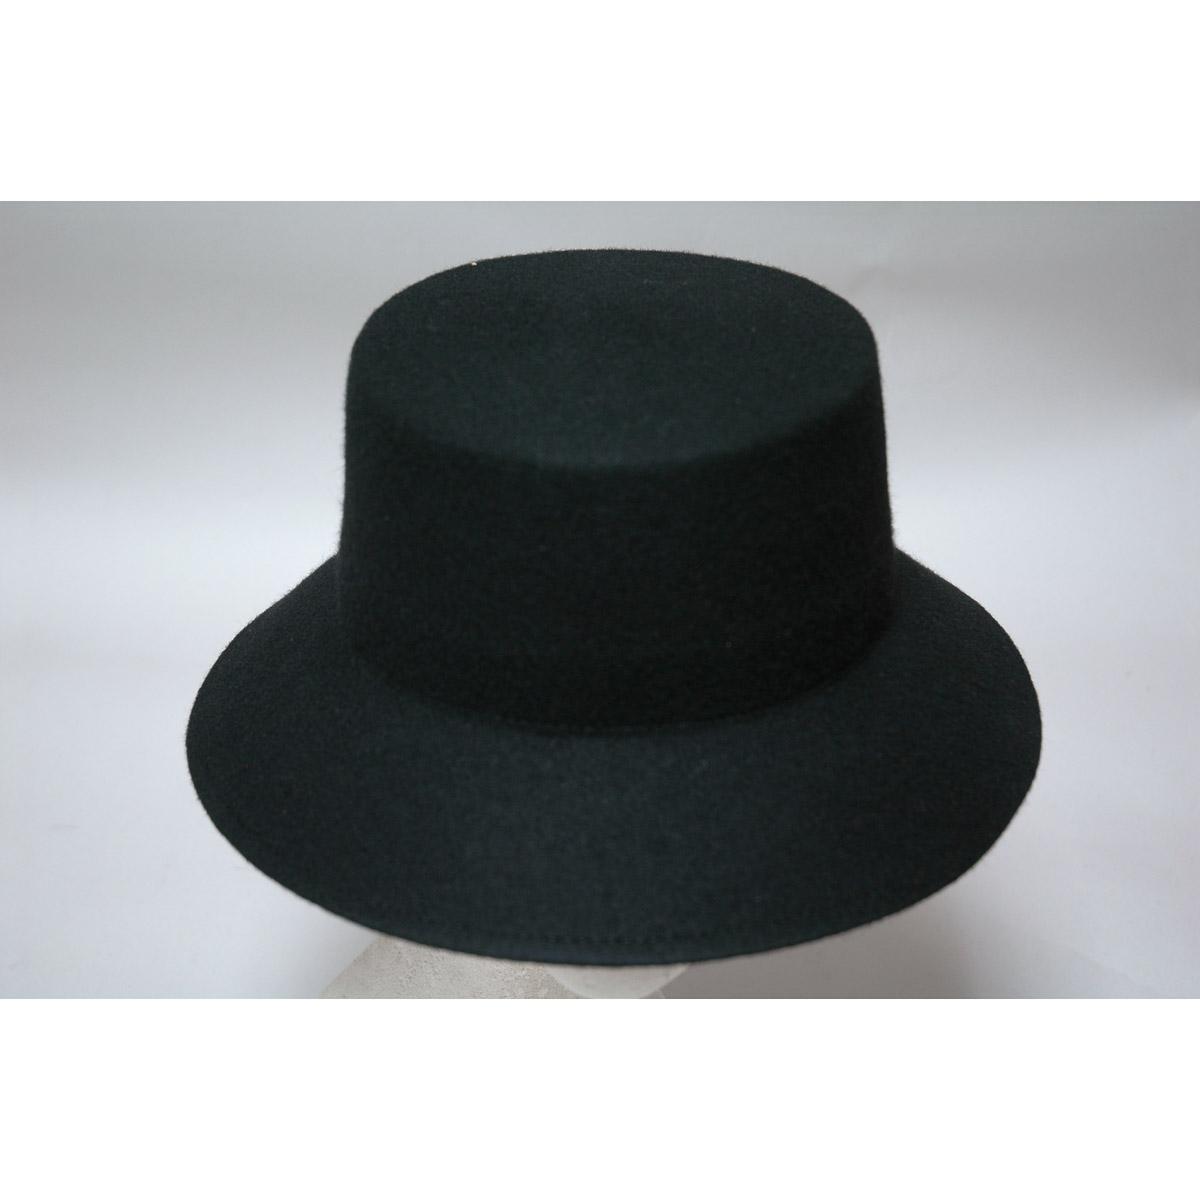 Black down brim Flat top Felt Hat Body  by Zoria 7447ed006cd